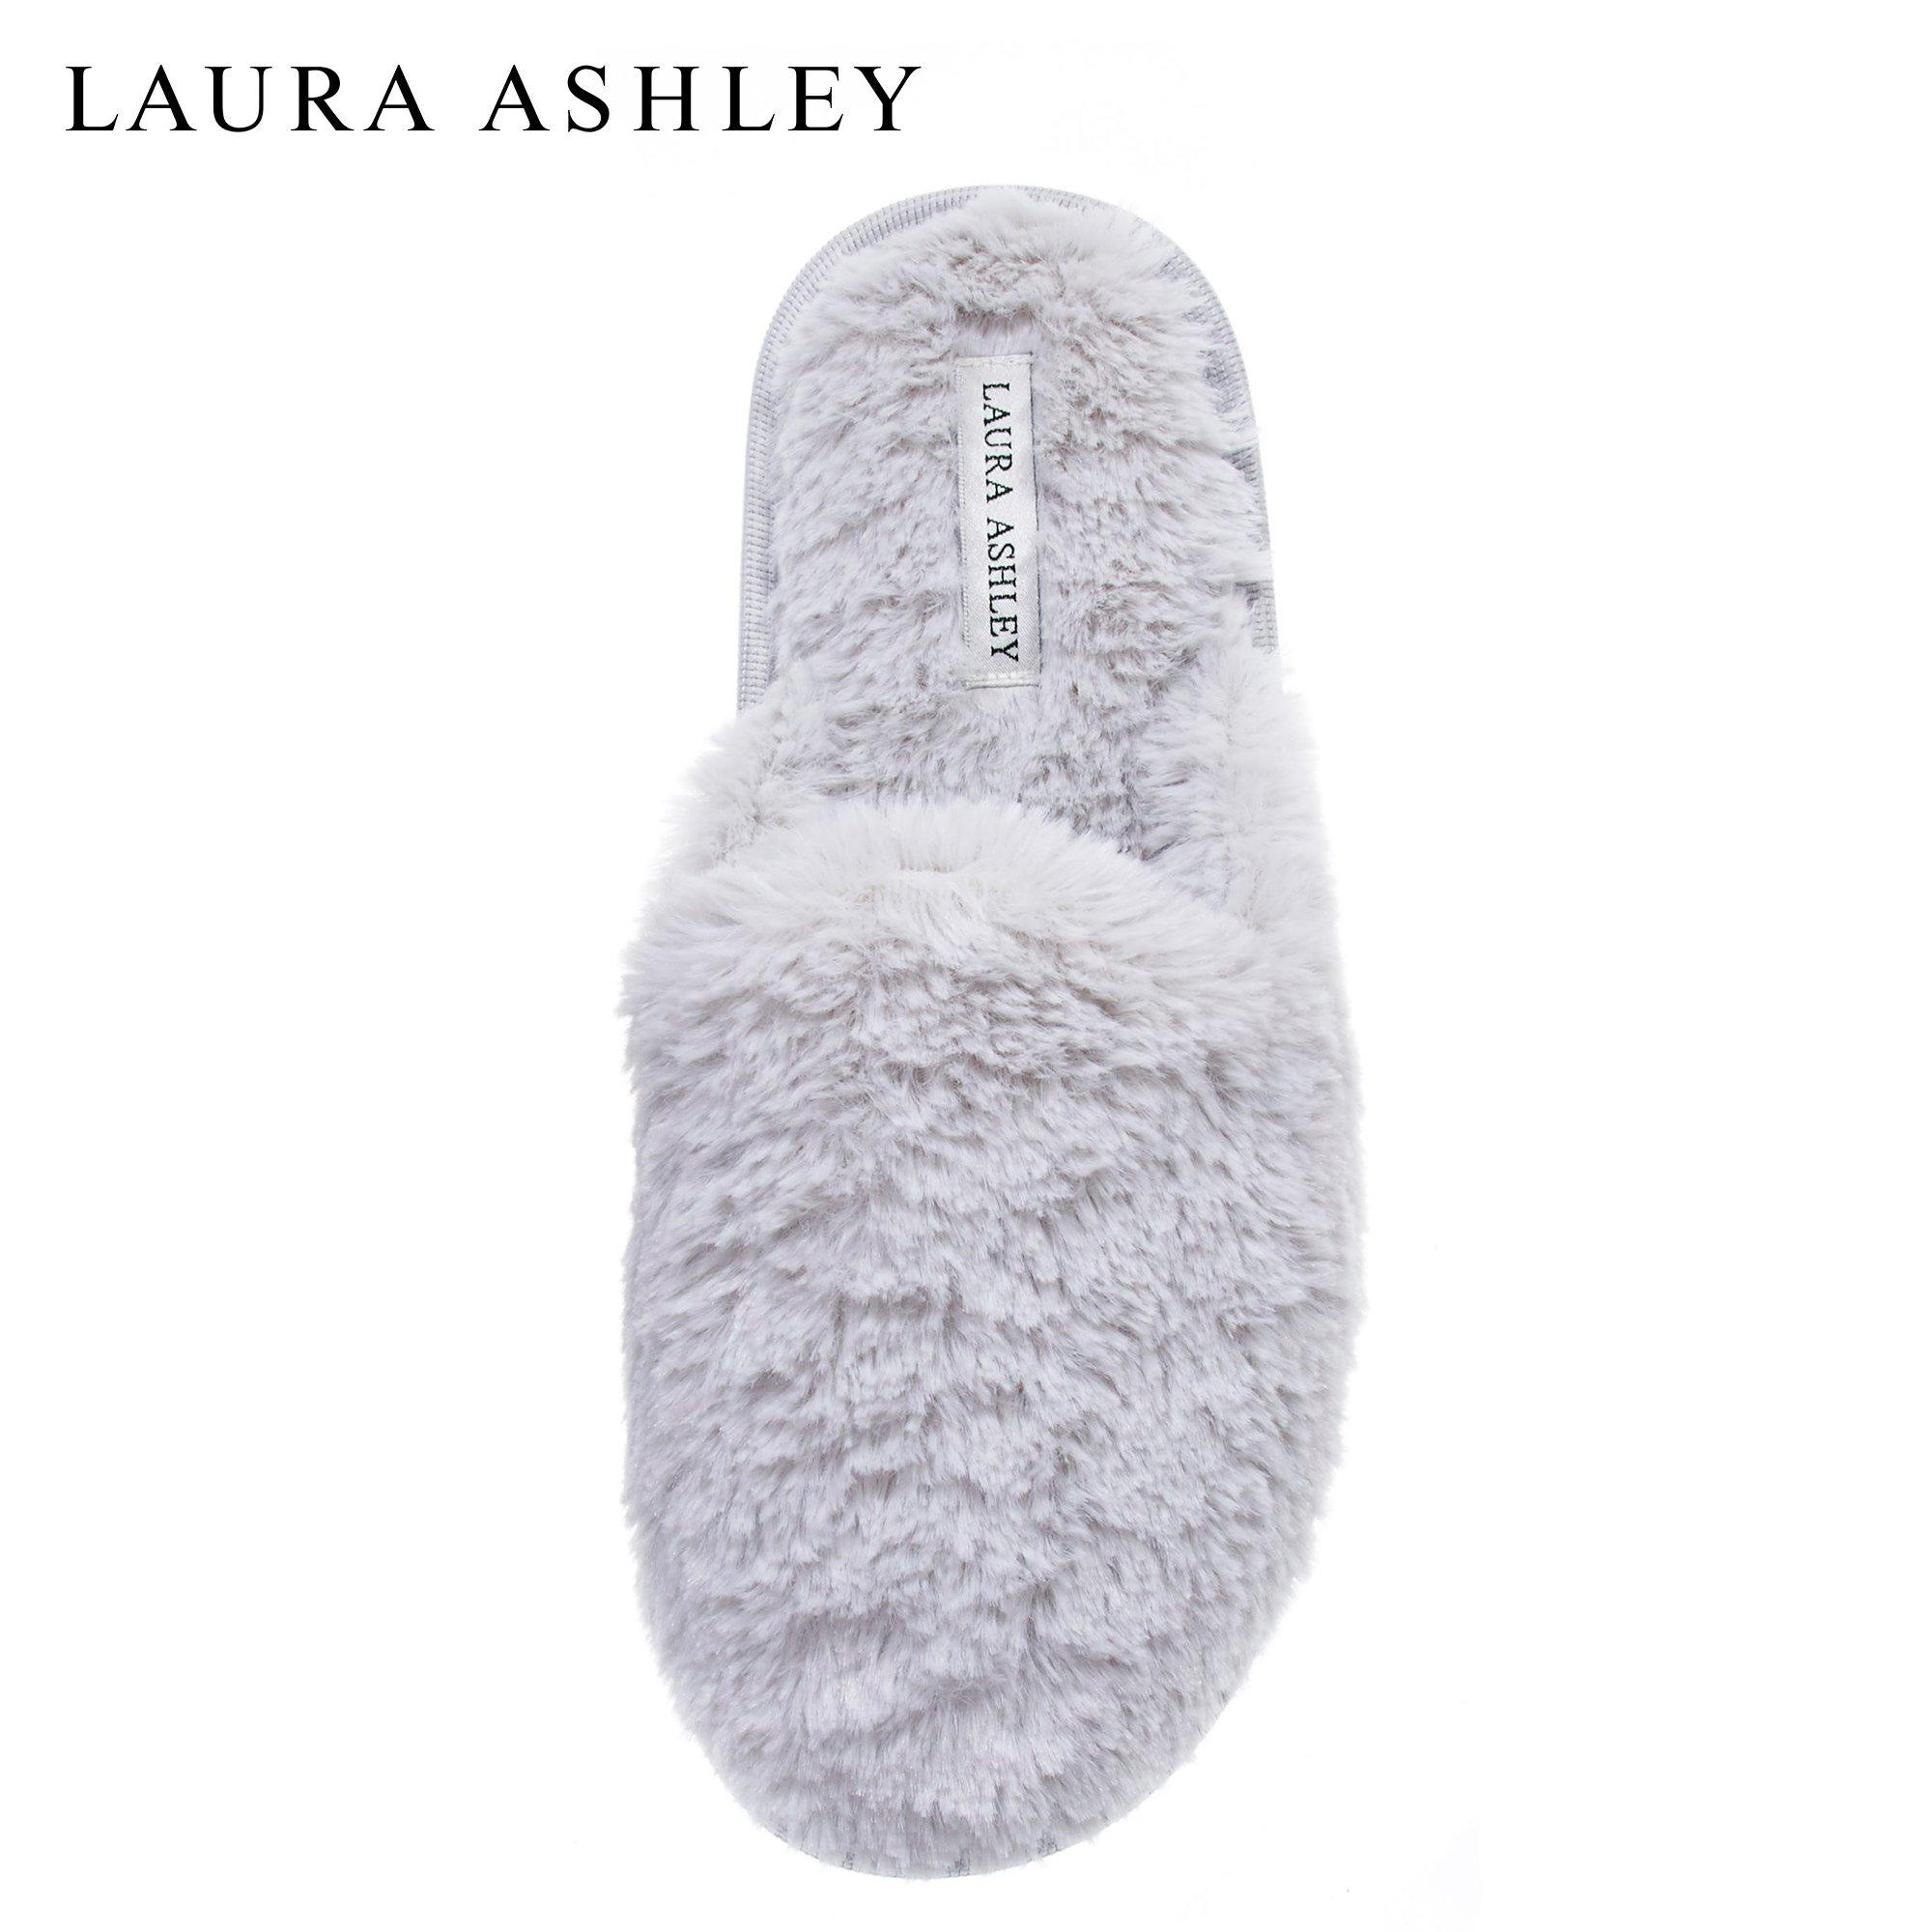 Laura Ashley Womens All Plush Memory Foam Scuff Slippers Light Grey Large